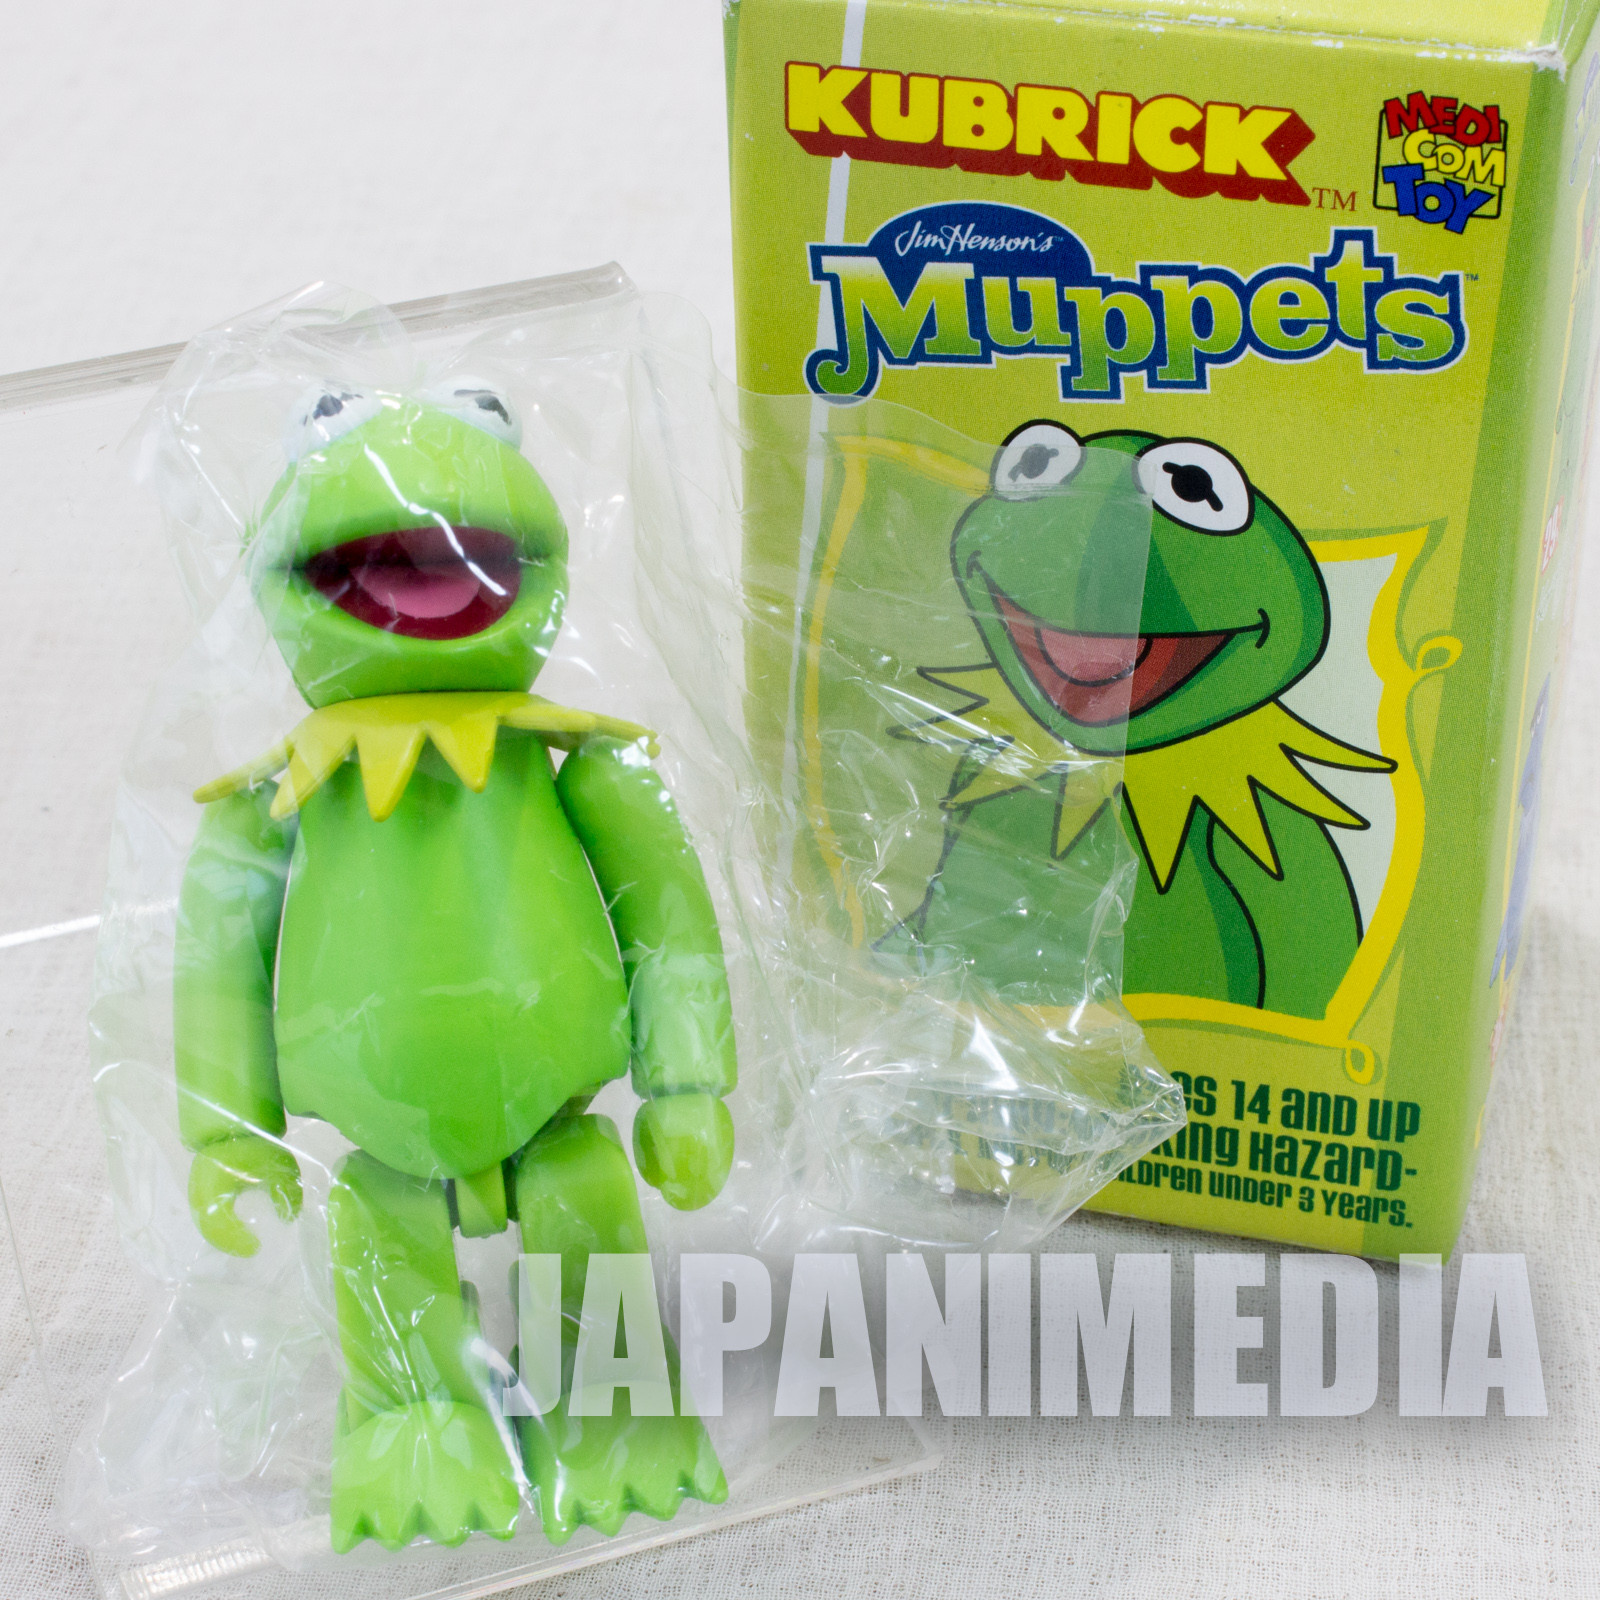 MUPPETS Kermit the Frog Kubrick Medicom Toy JAPAN FIGURE SESAME STREET